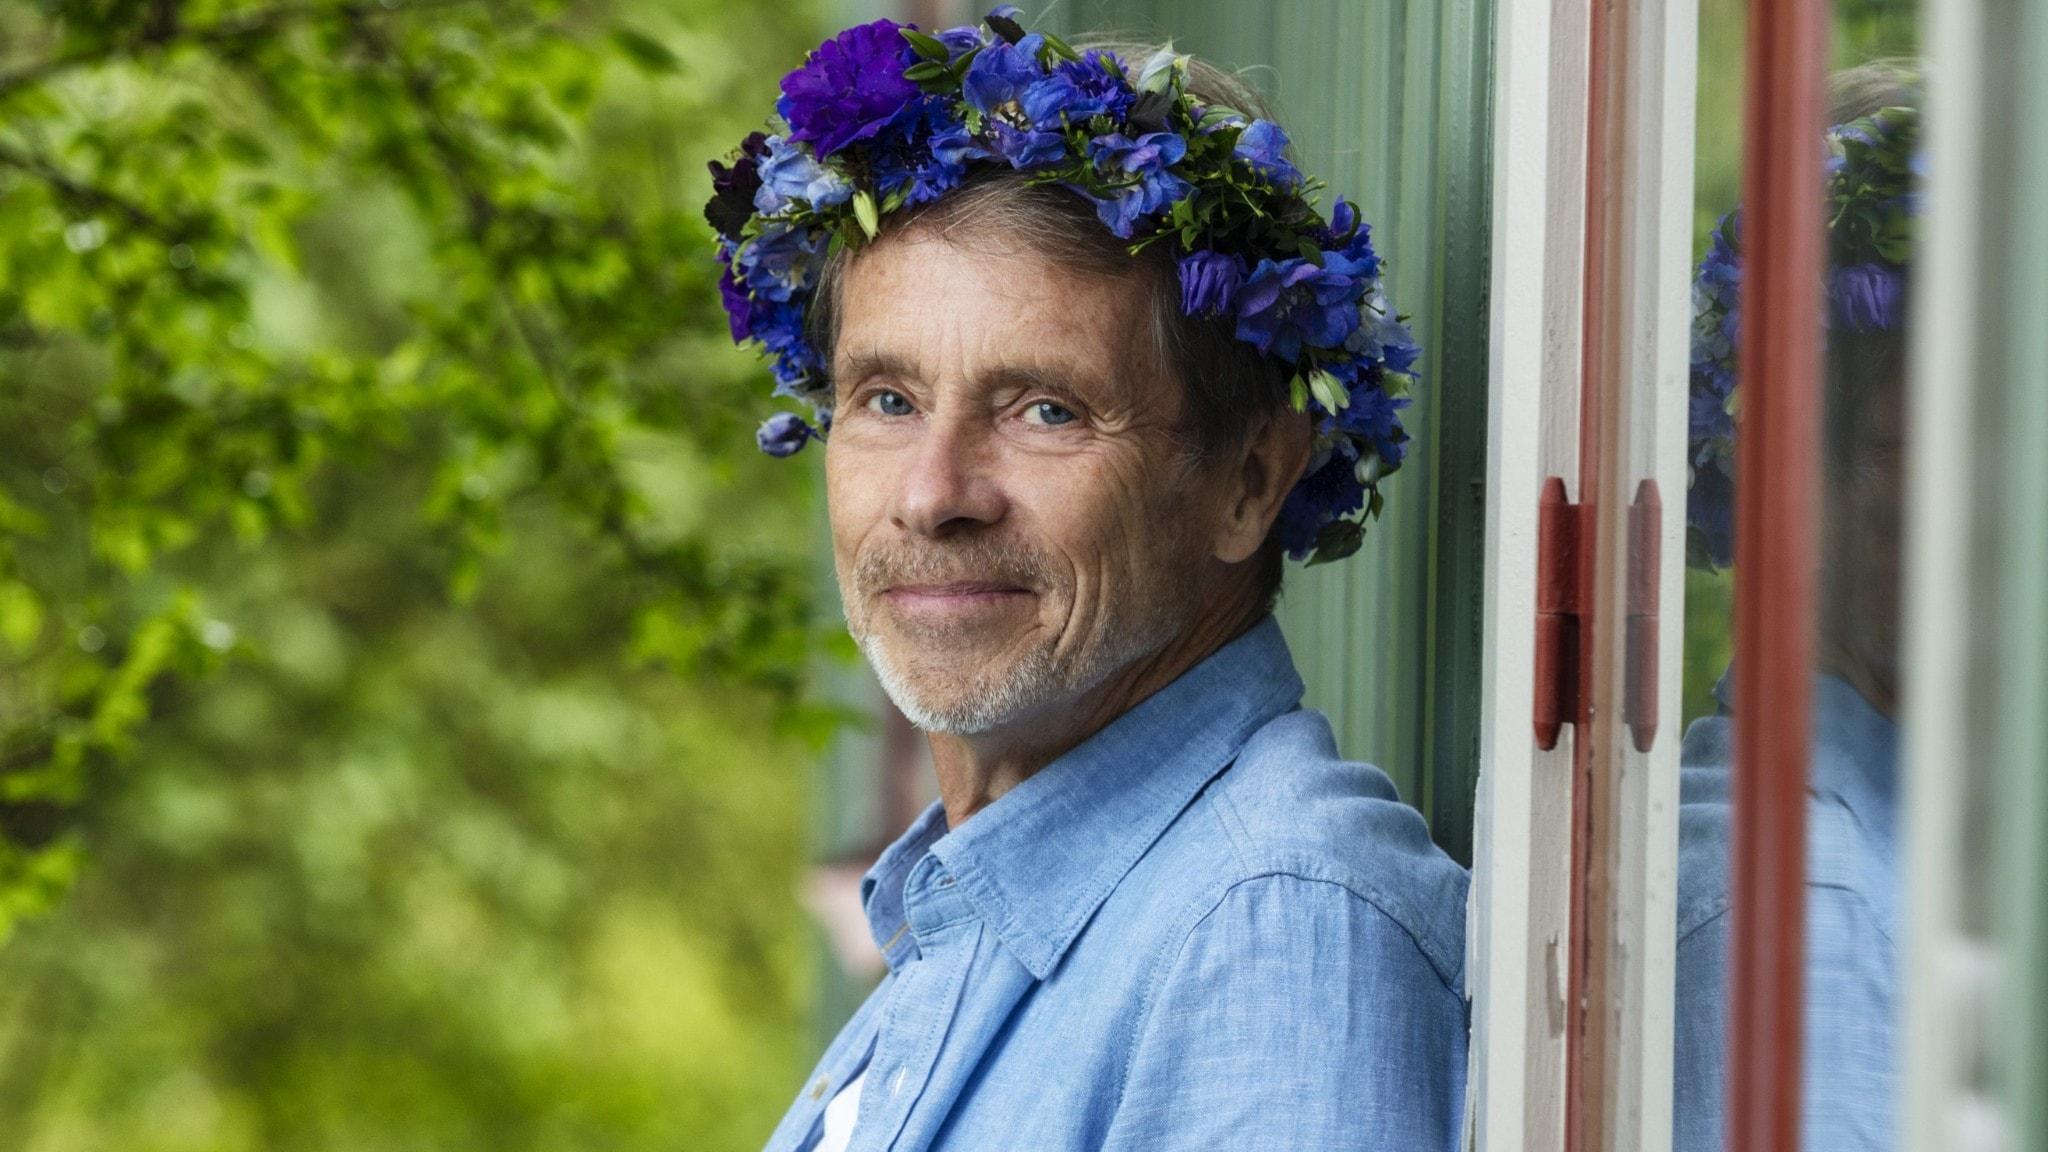 Jacob Hård af Segerstad i blomsterkrans lutar sig mot en vägg.